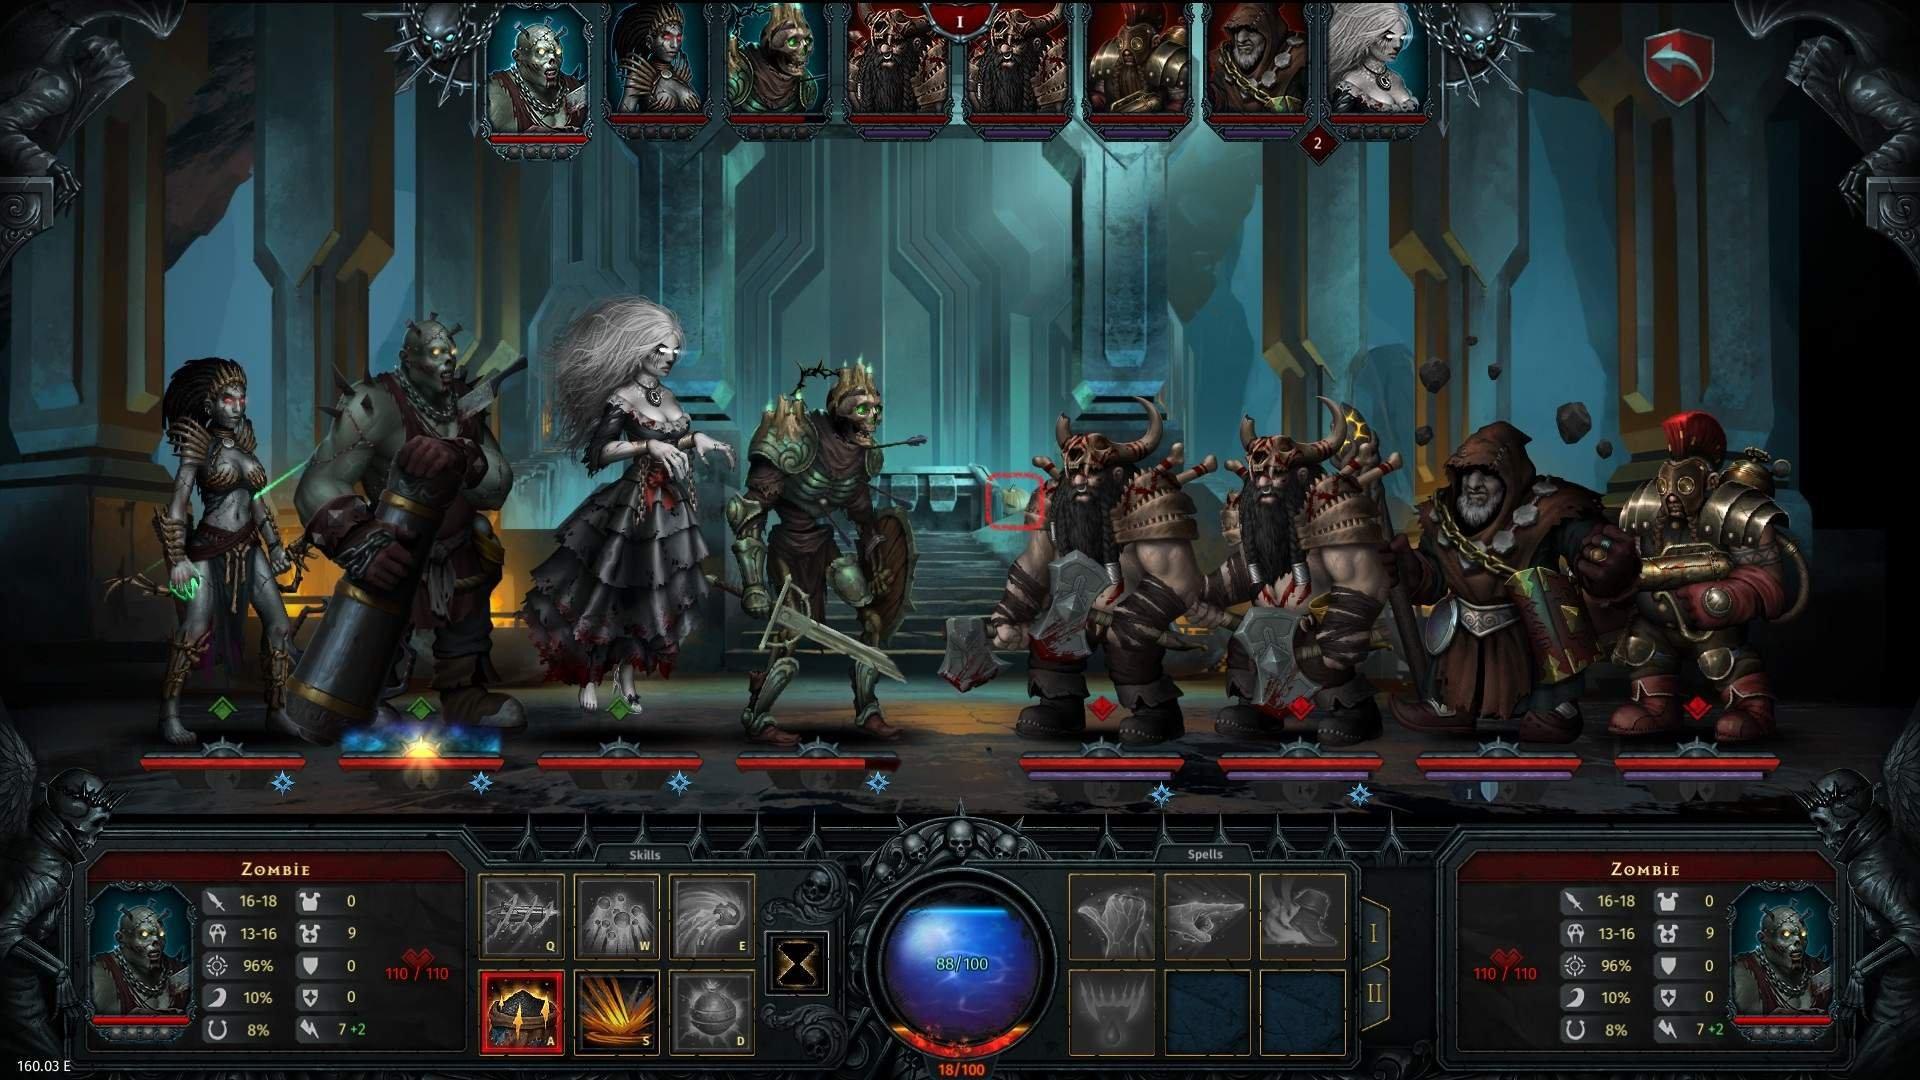 Screenshot for the game Iratus: Lord of the Dead v.176.16.01 [GOG] (2020) скачать торрент Лицензия